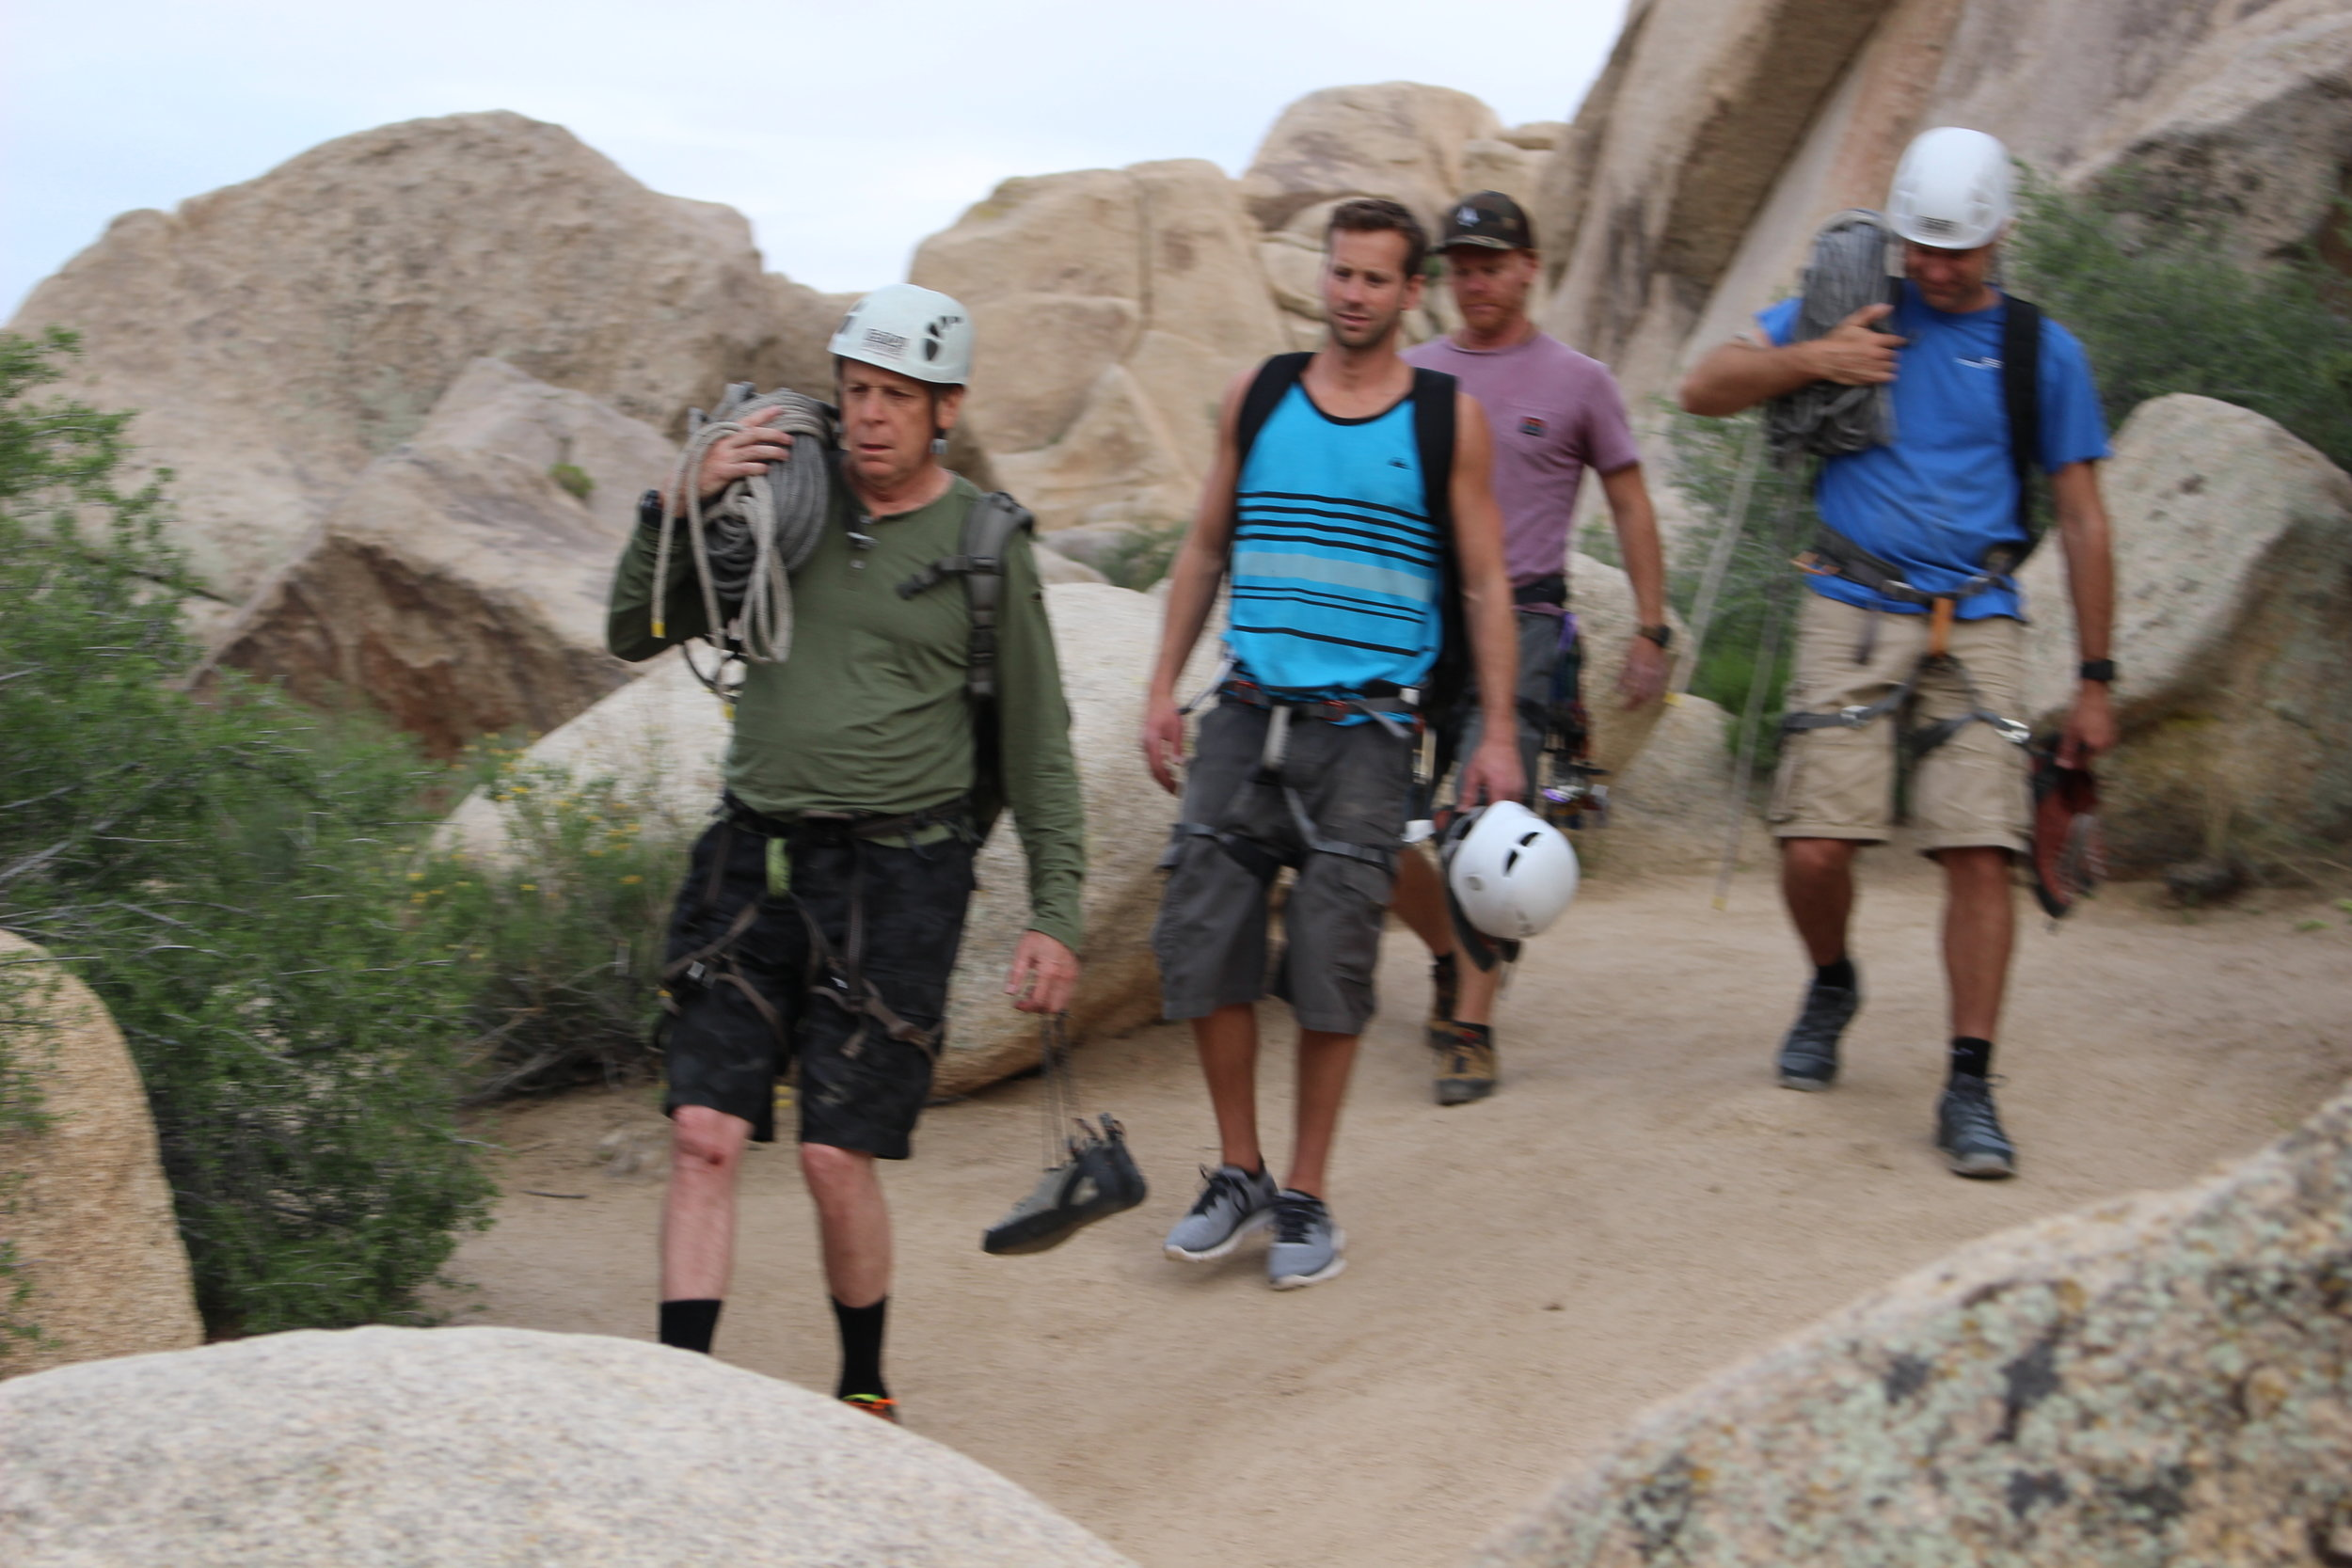 Climbing Joshua Tree Desert STG 001  (1).JPG